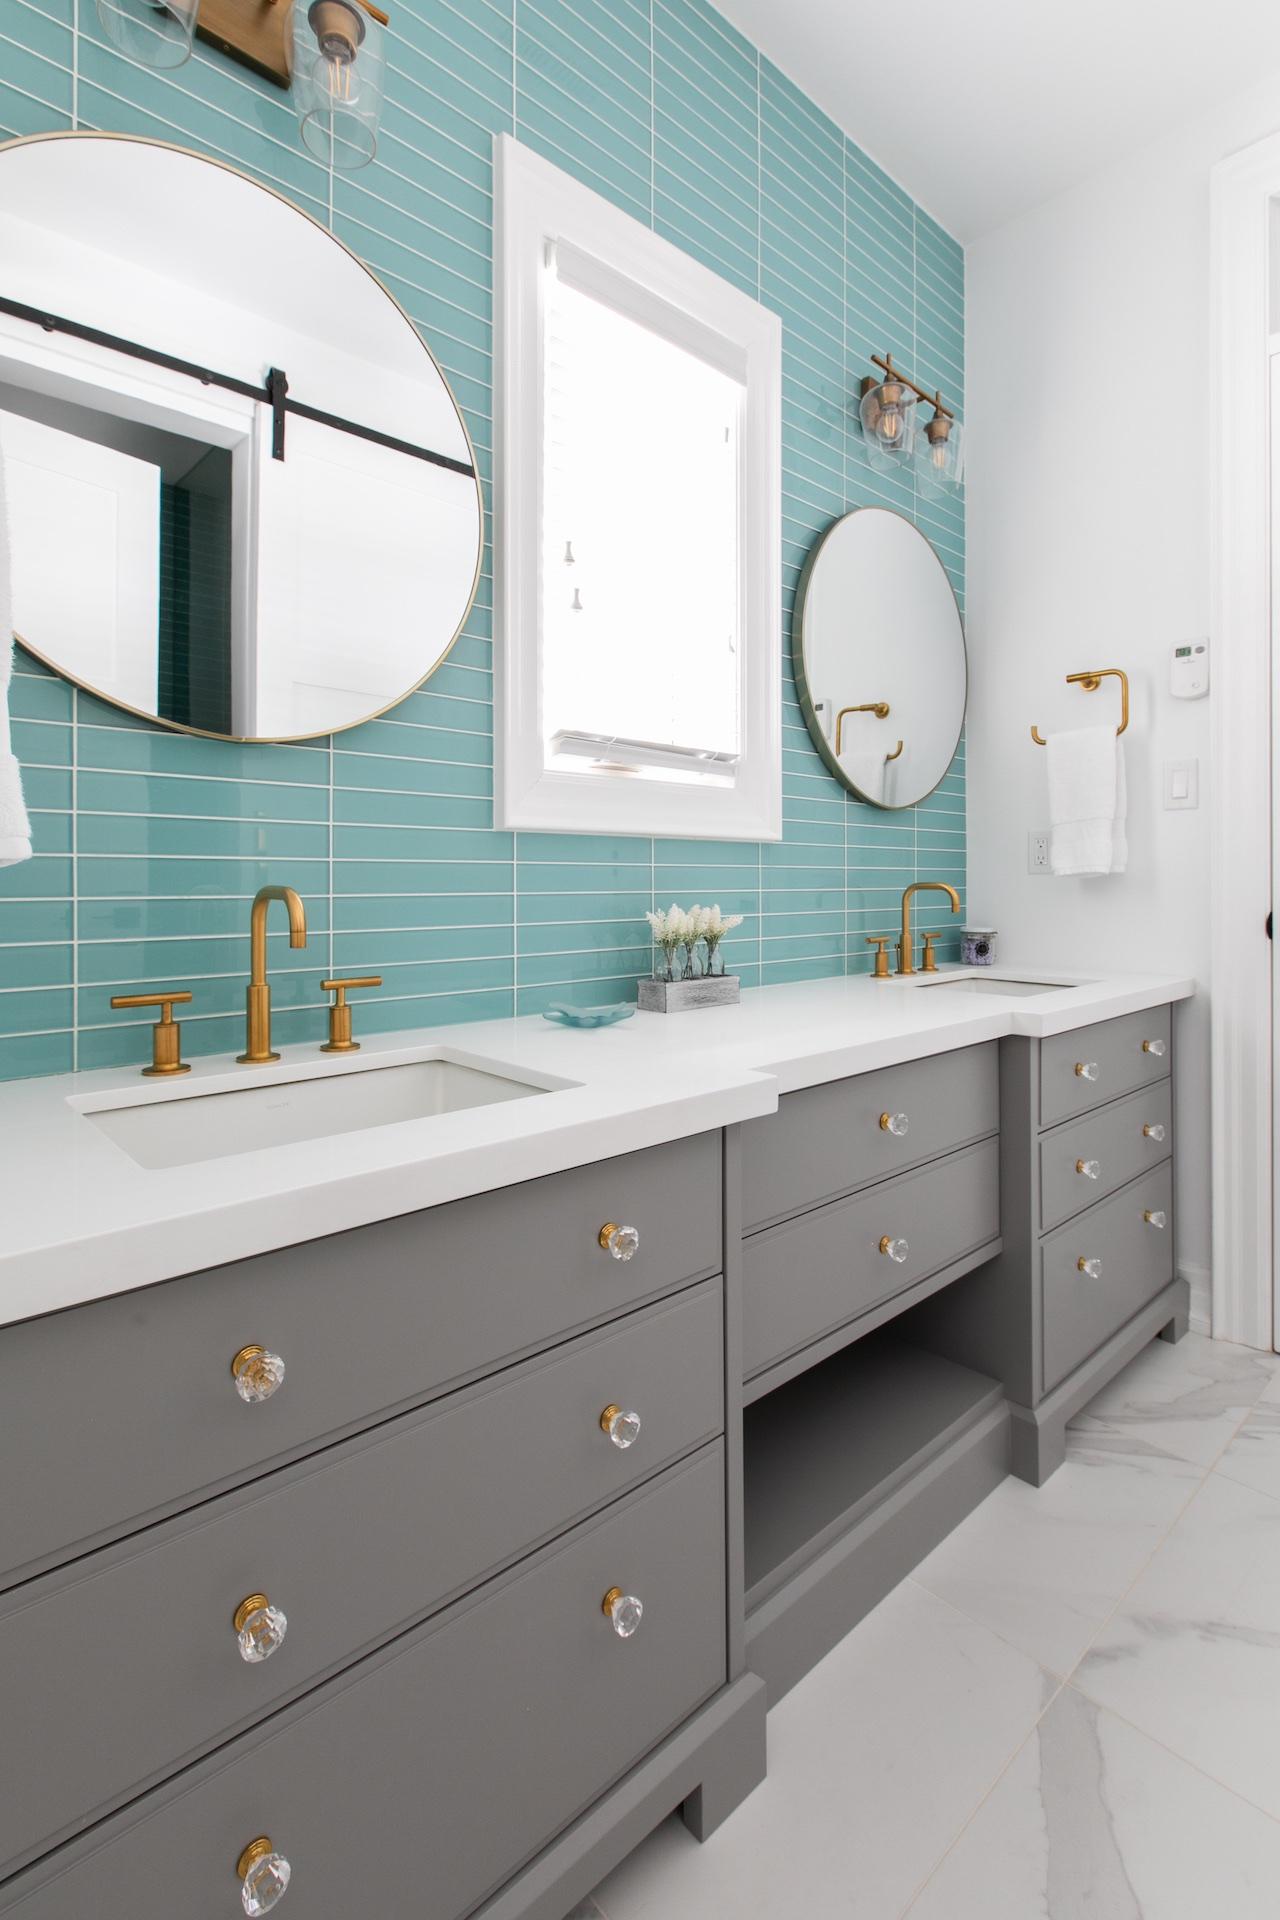 grey vanity drawers and green backsplash